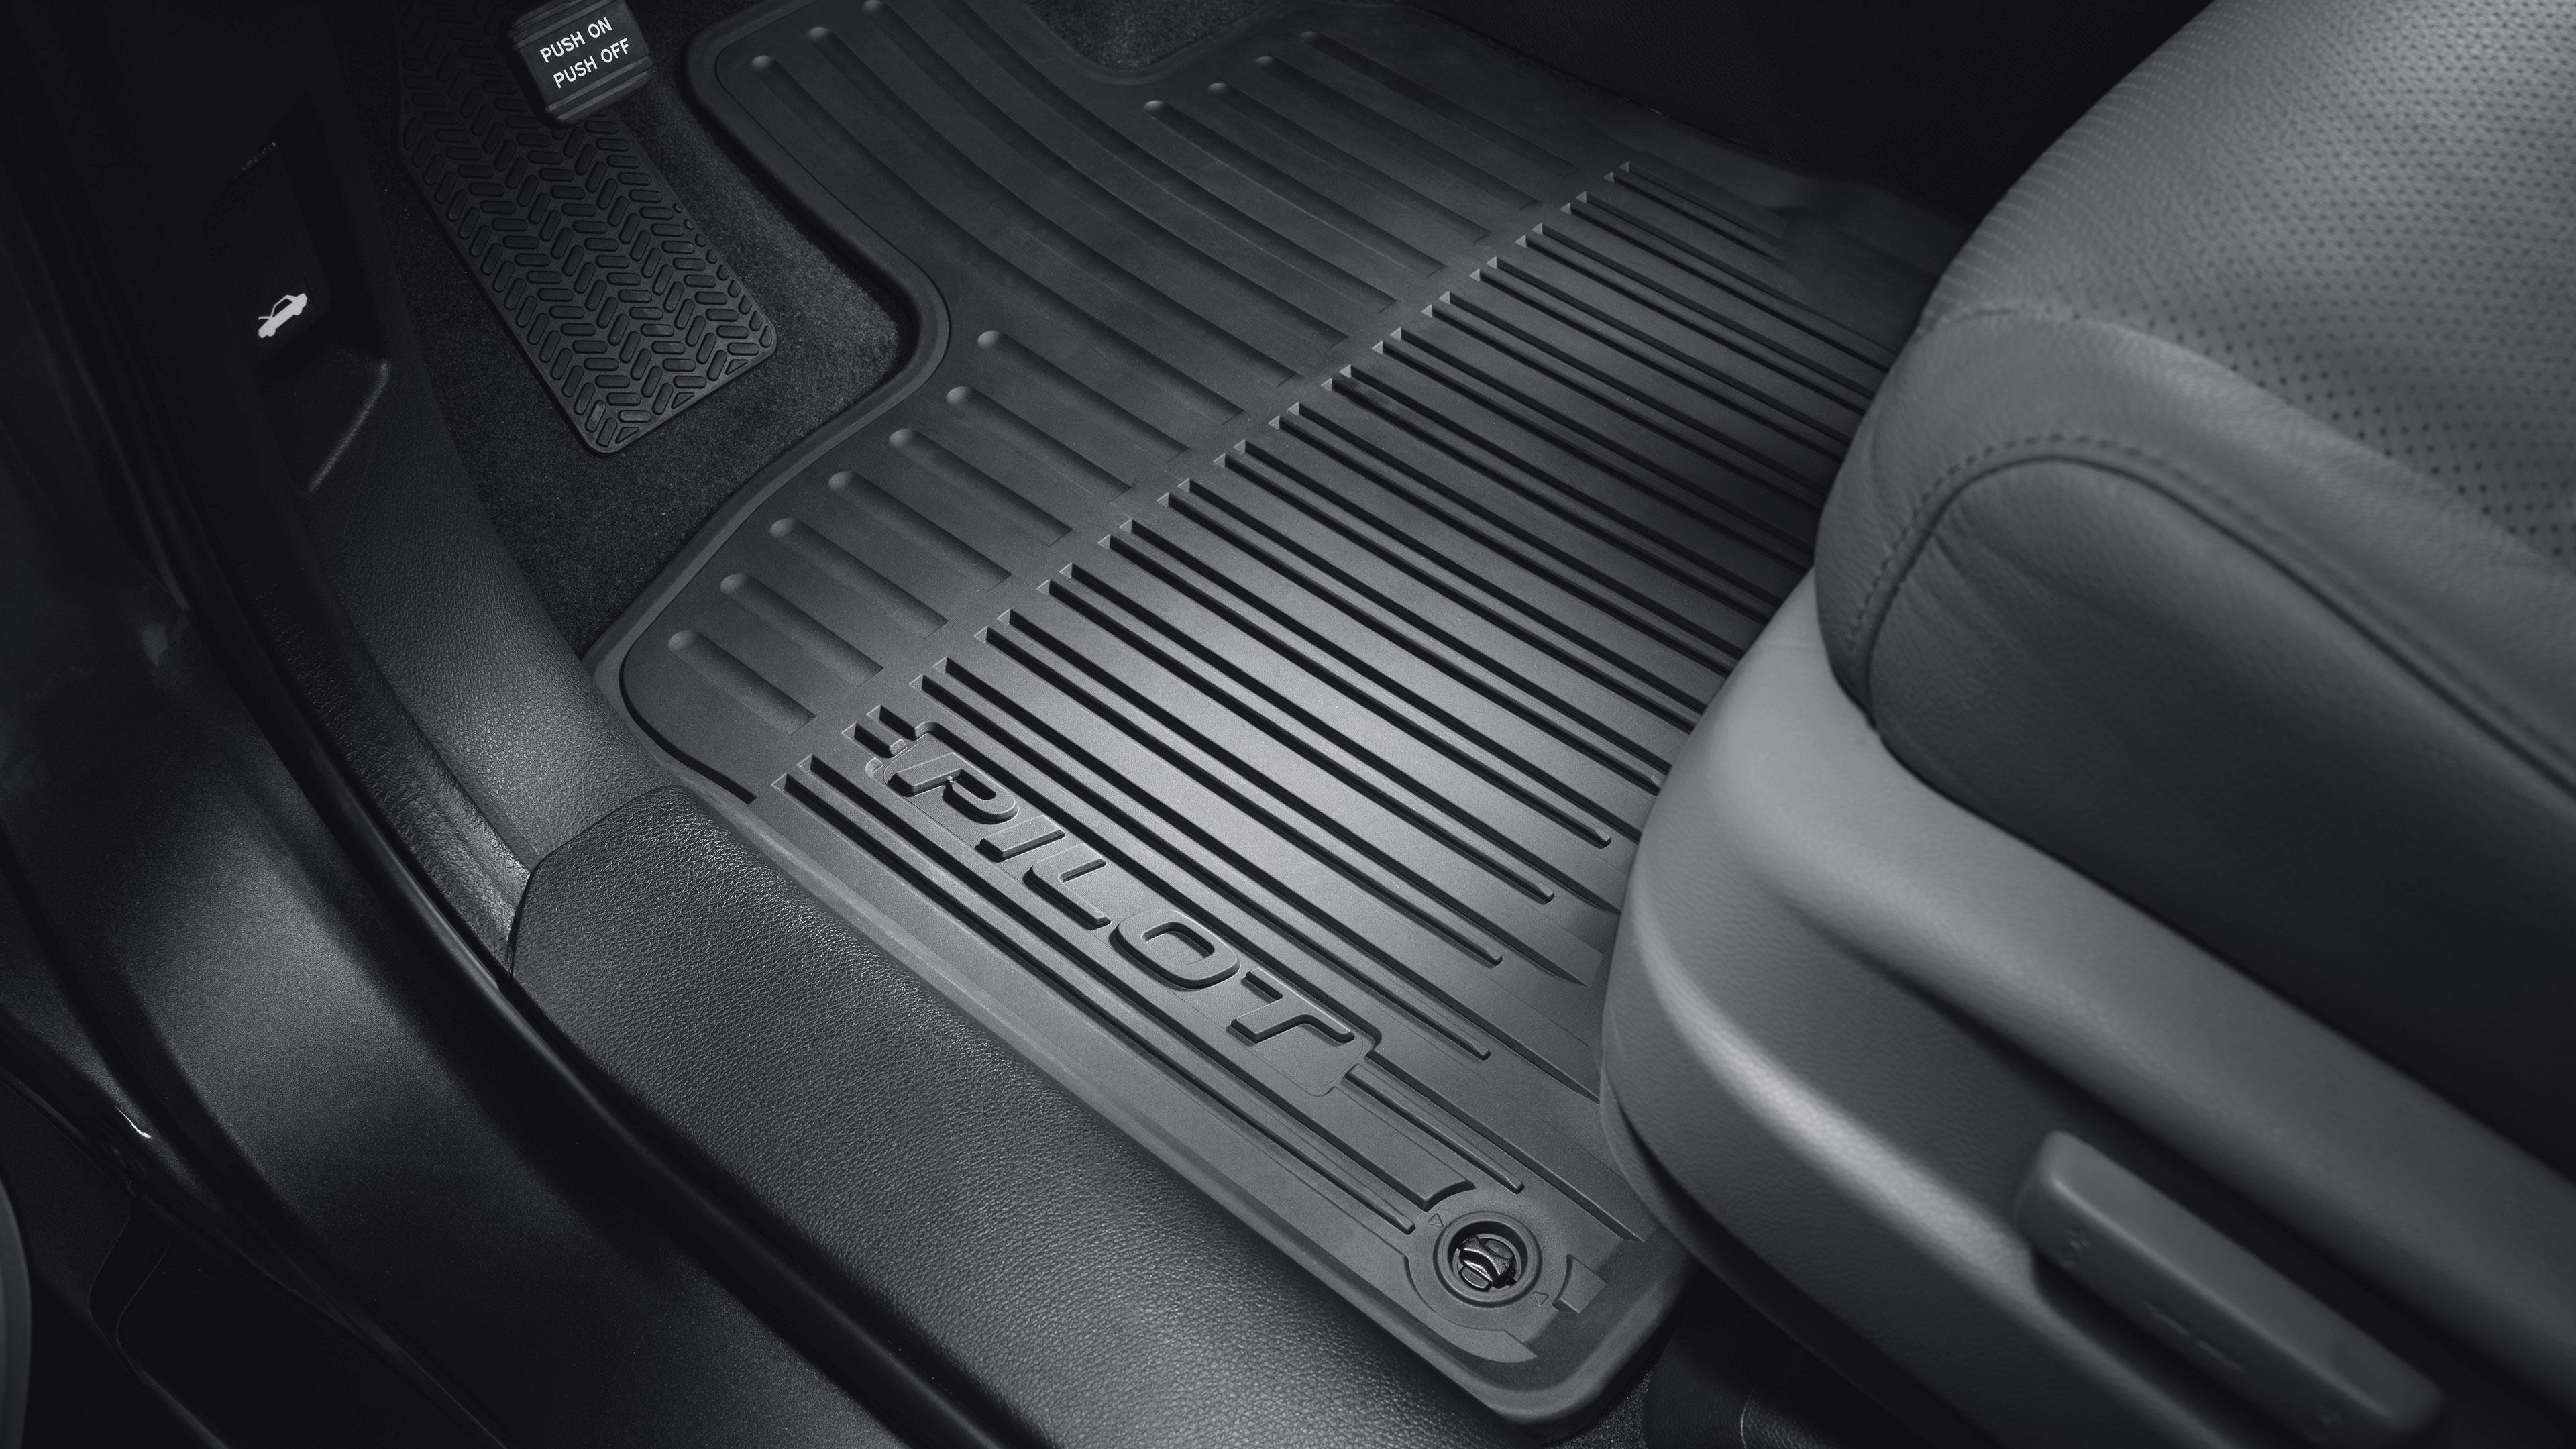 car honda mat do style team diy nomad page bhp yourself forum mats floor